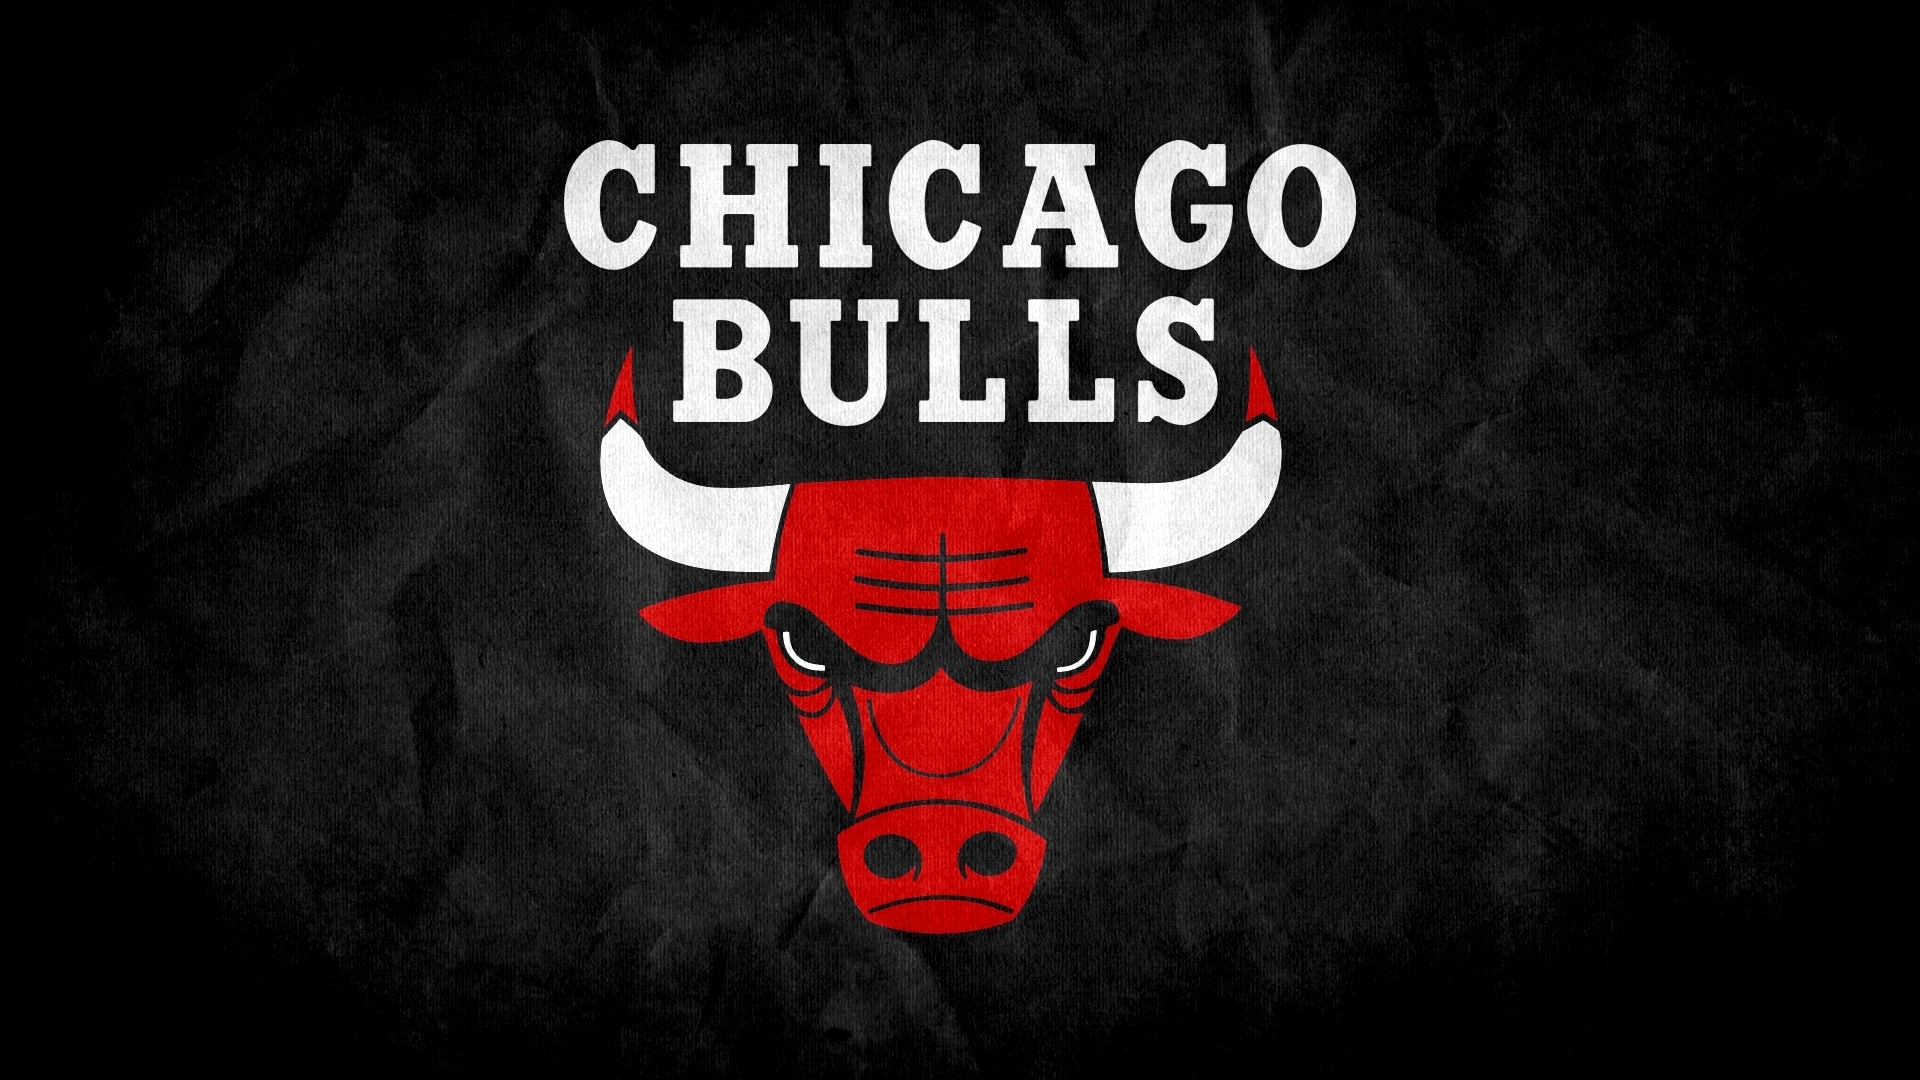 chicago bulls full hd fond d'écran and arrière-plan | 1920x1080 | id